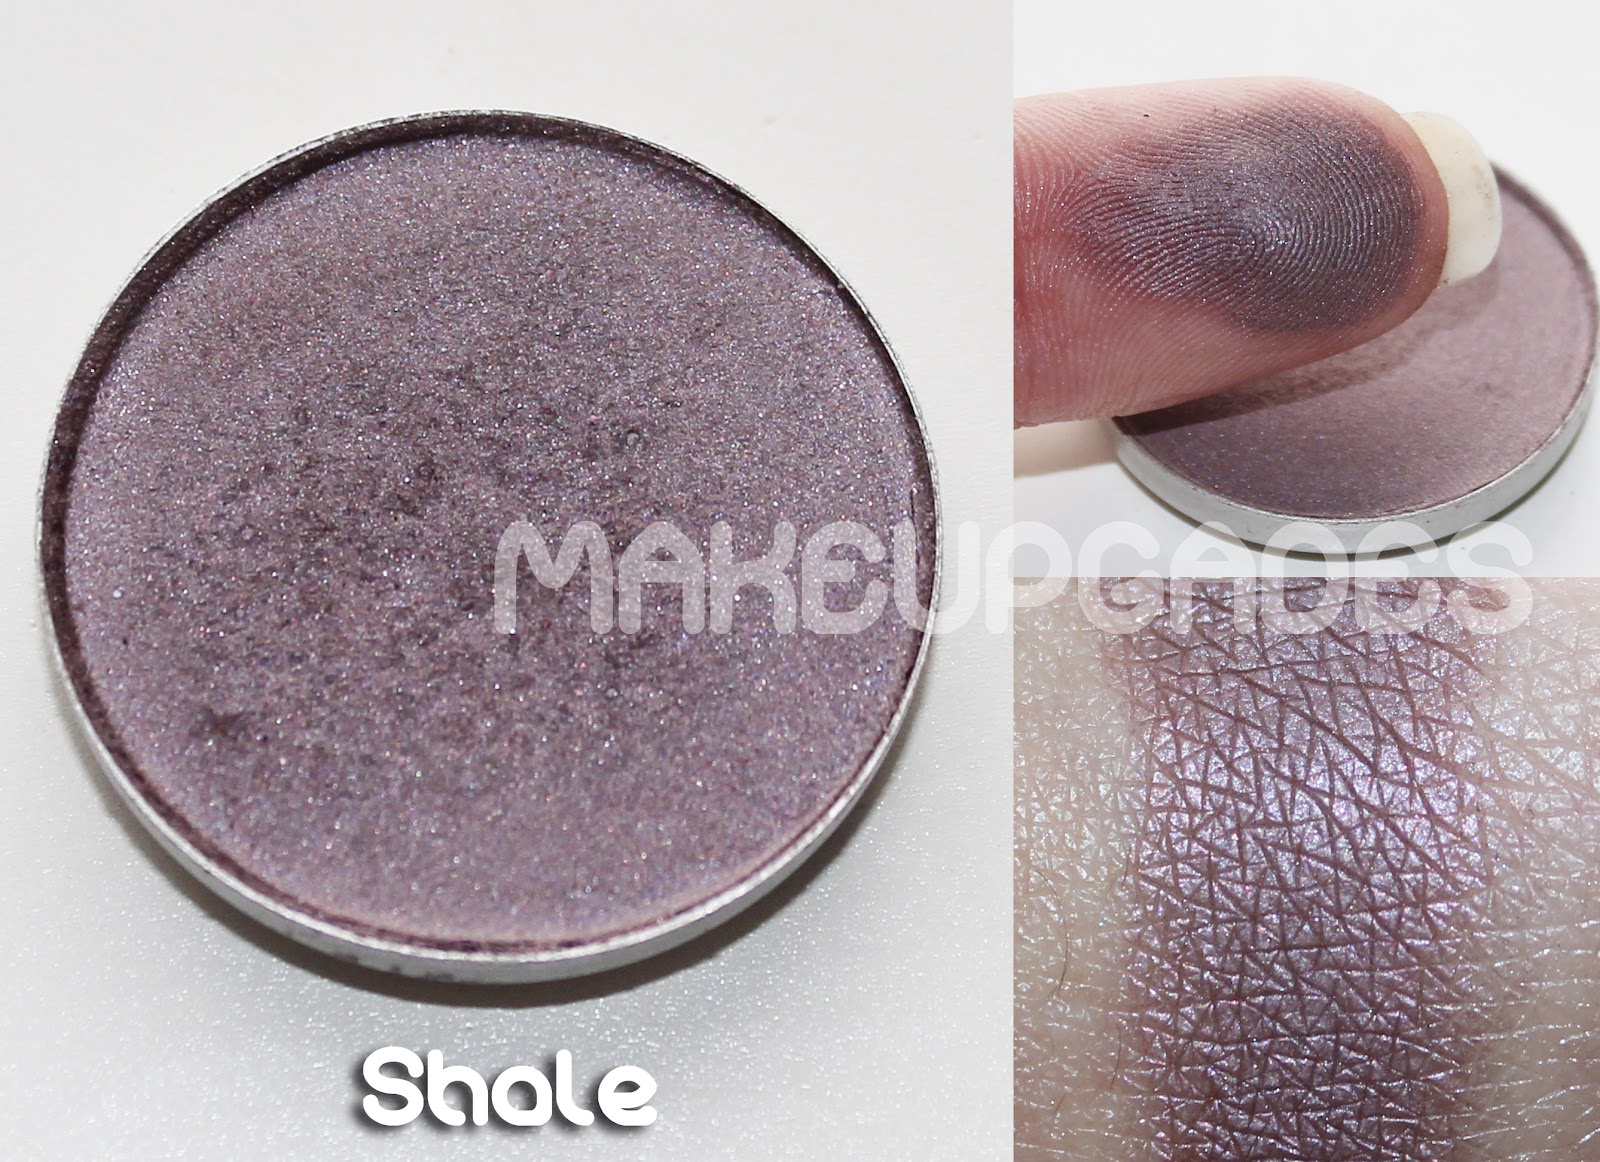 Shale mac